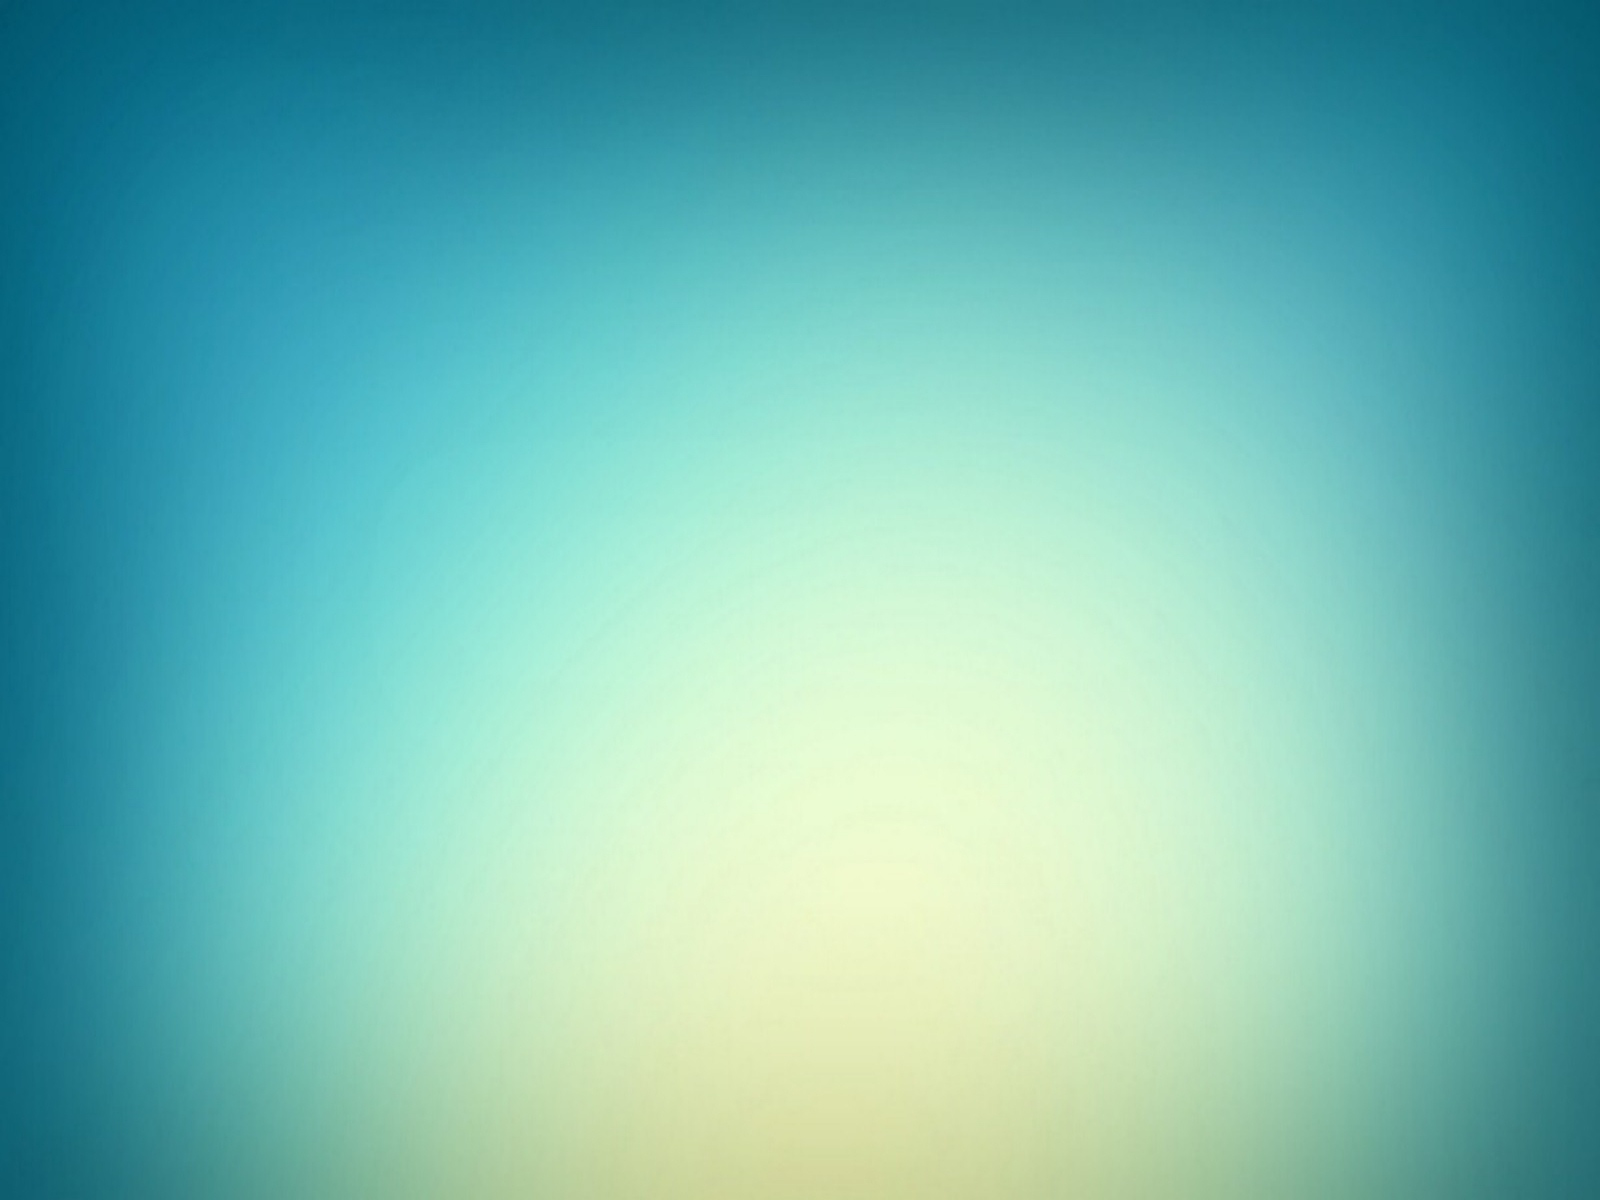 Clear Wallpaper Background - WallpaperSafari